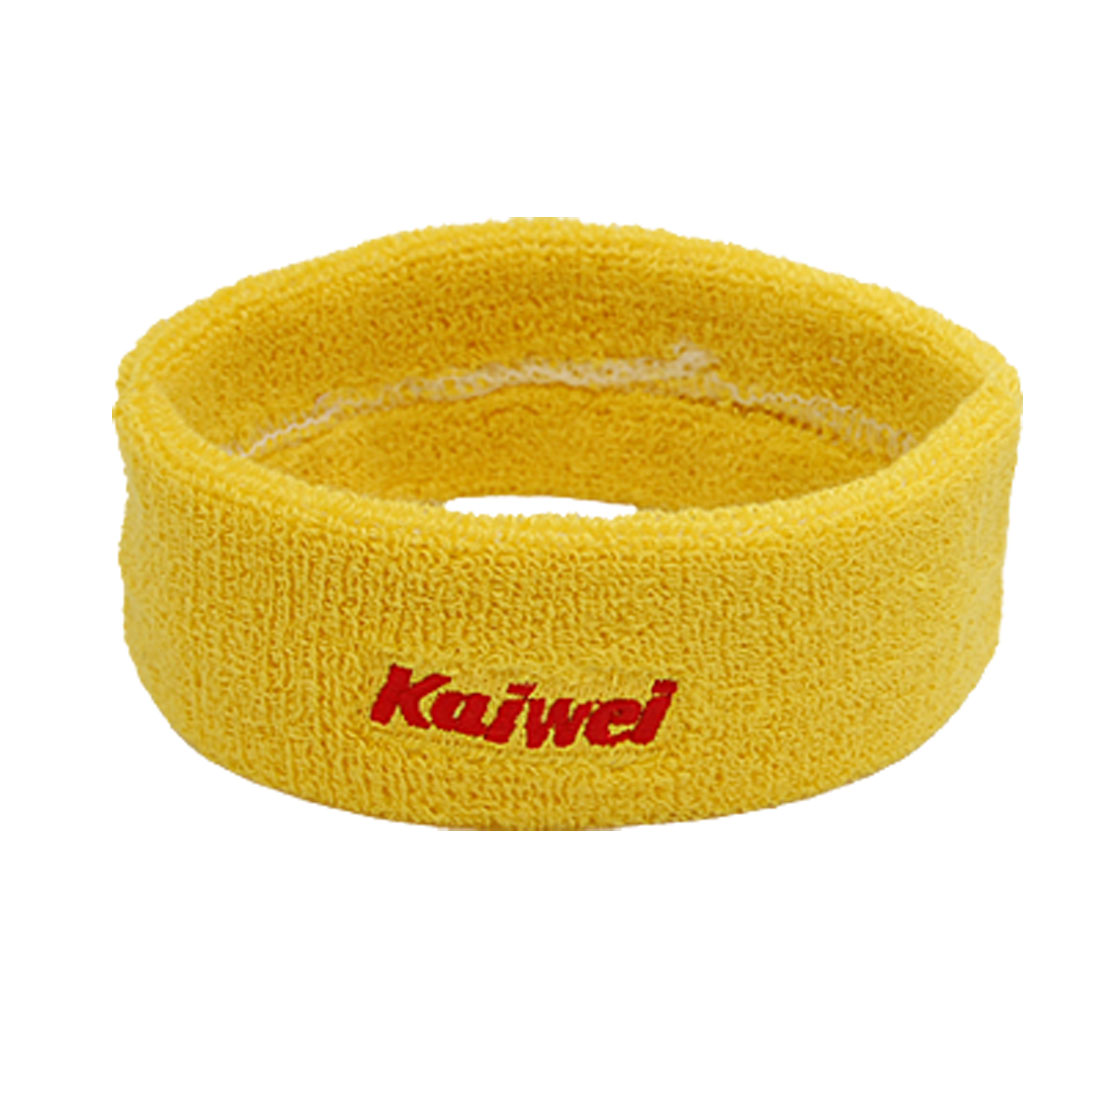 "Sports Athletic Elastic Fabric Sweat Head Band Headband 1.8"" Width Yellow"